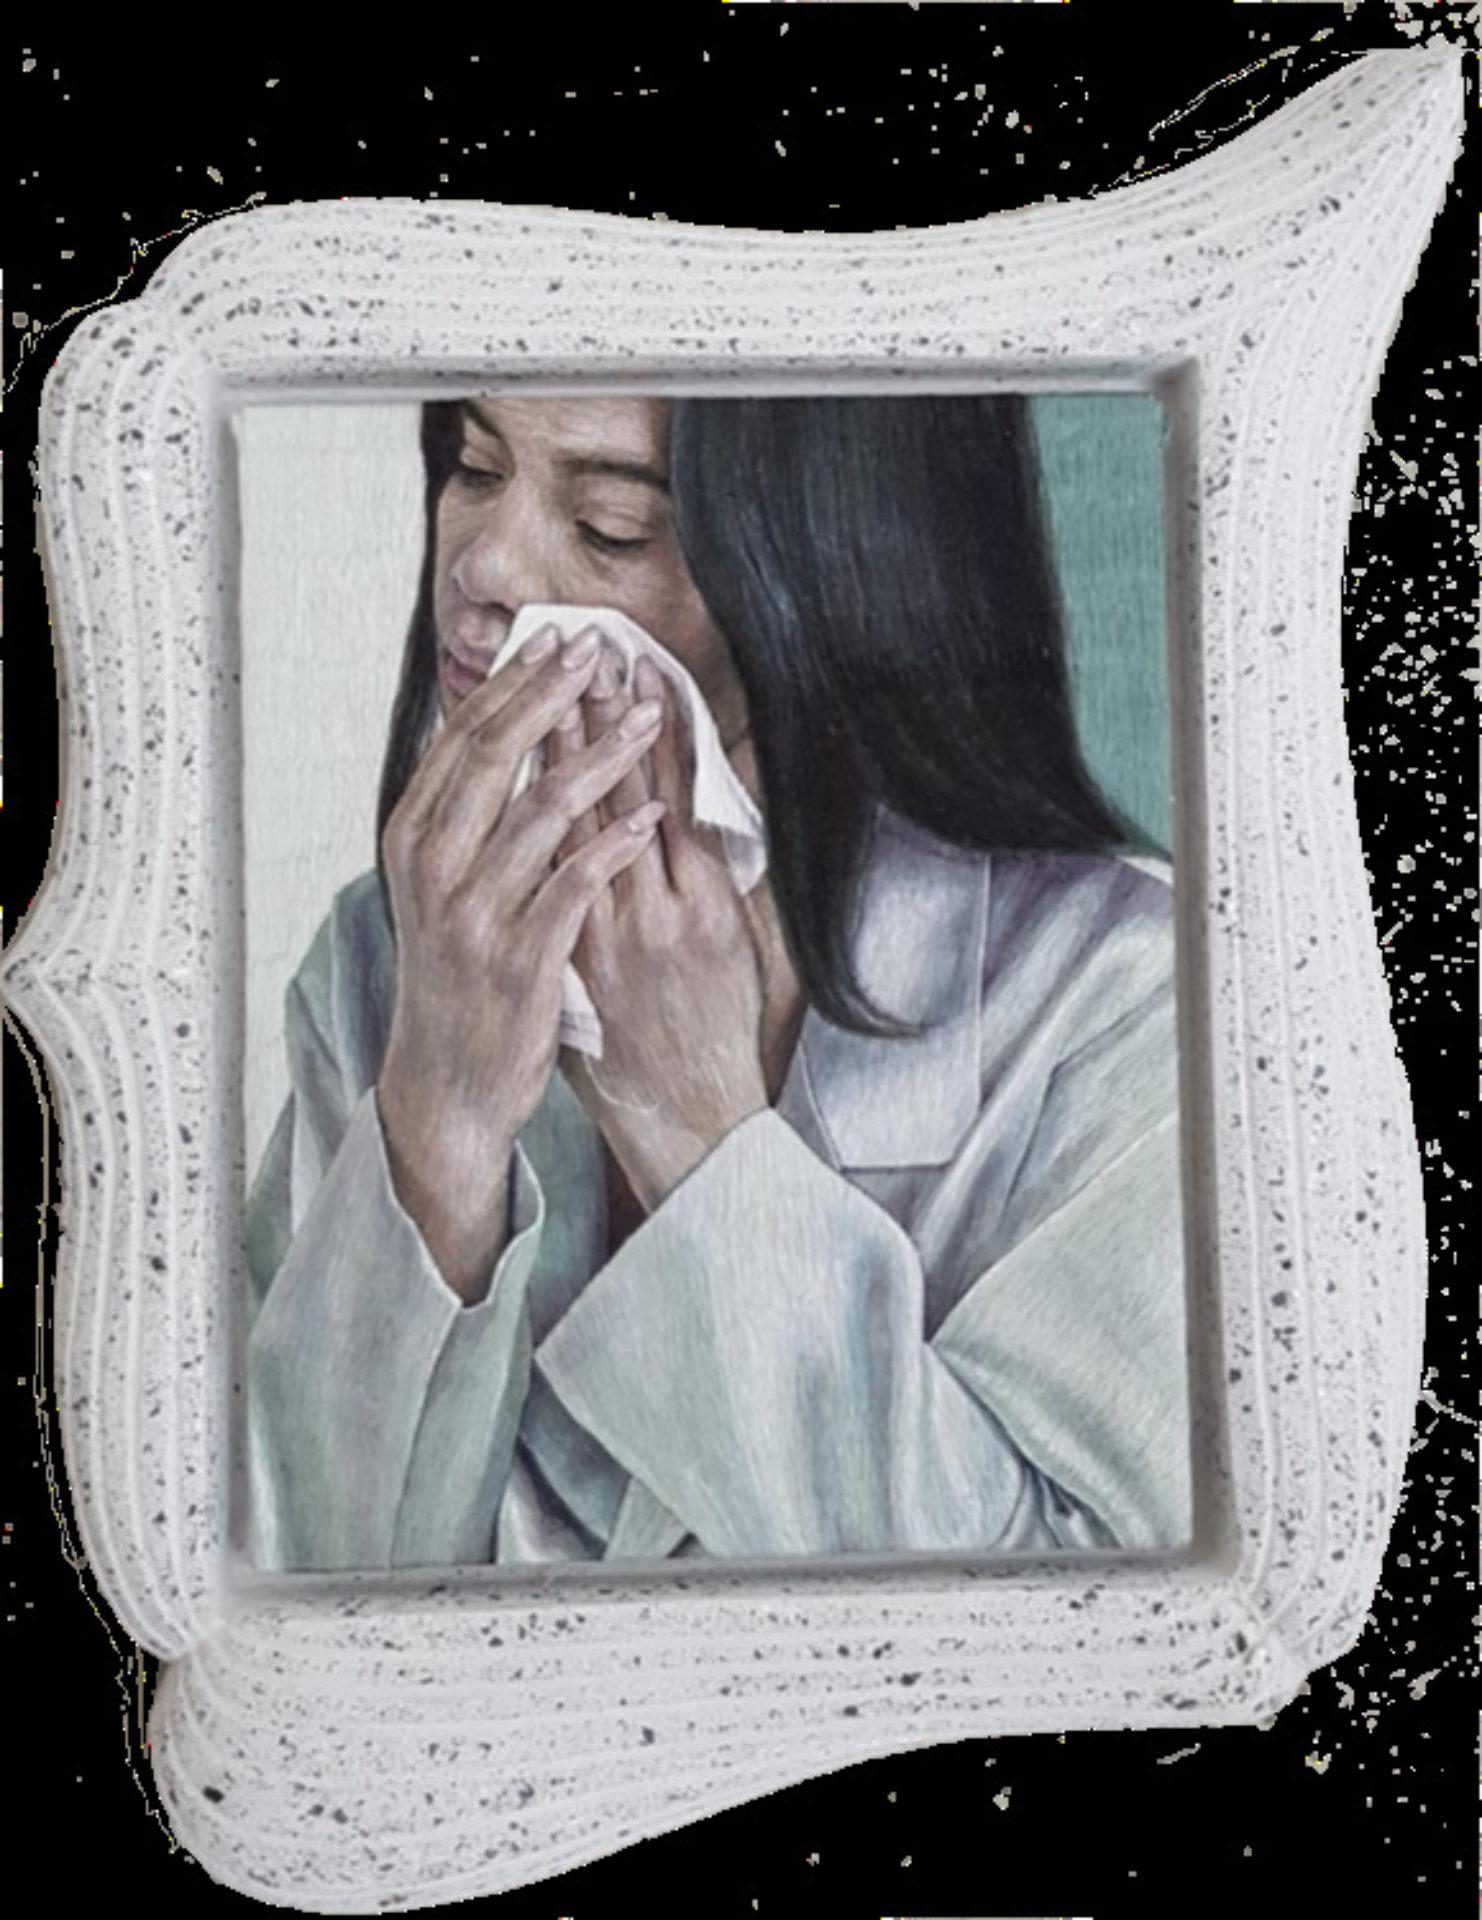 Klára Hosnedlová, Untitled, from the Series 'Ladies` Tears`, 2019